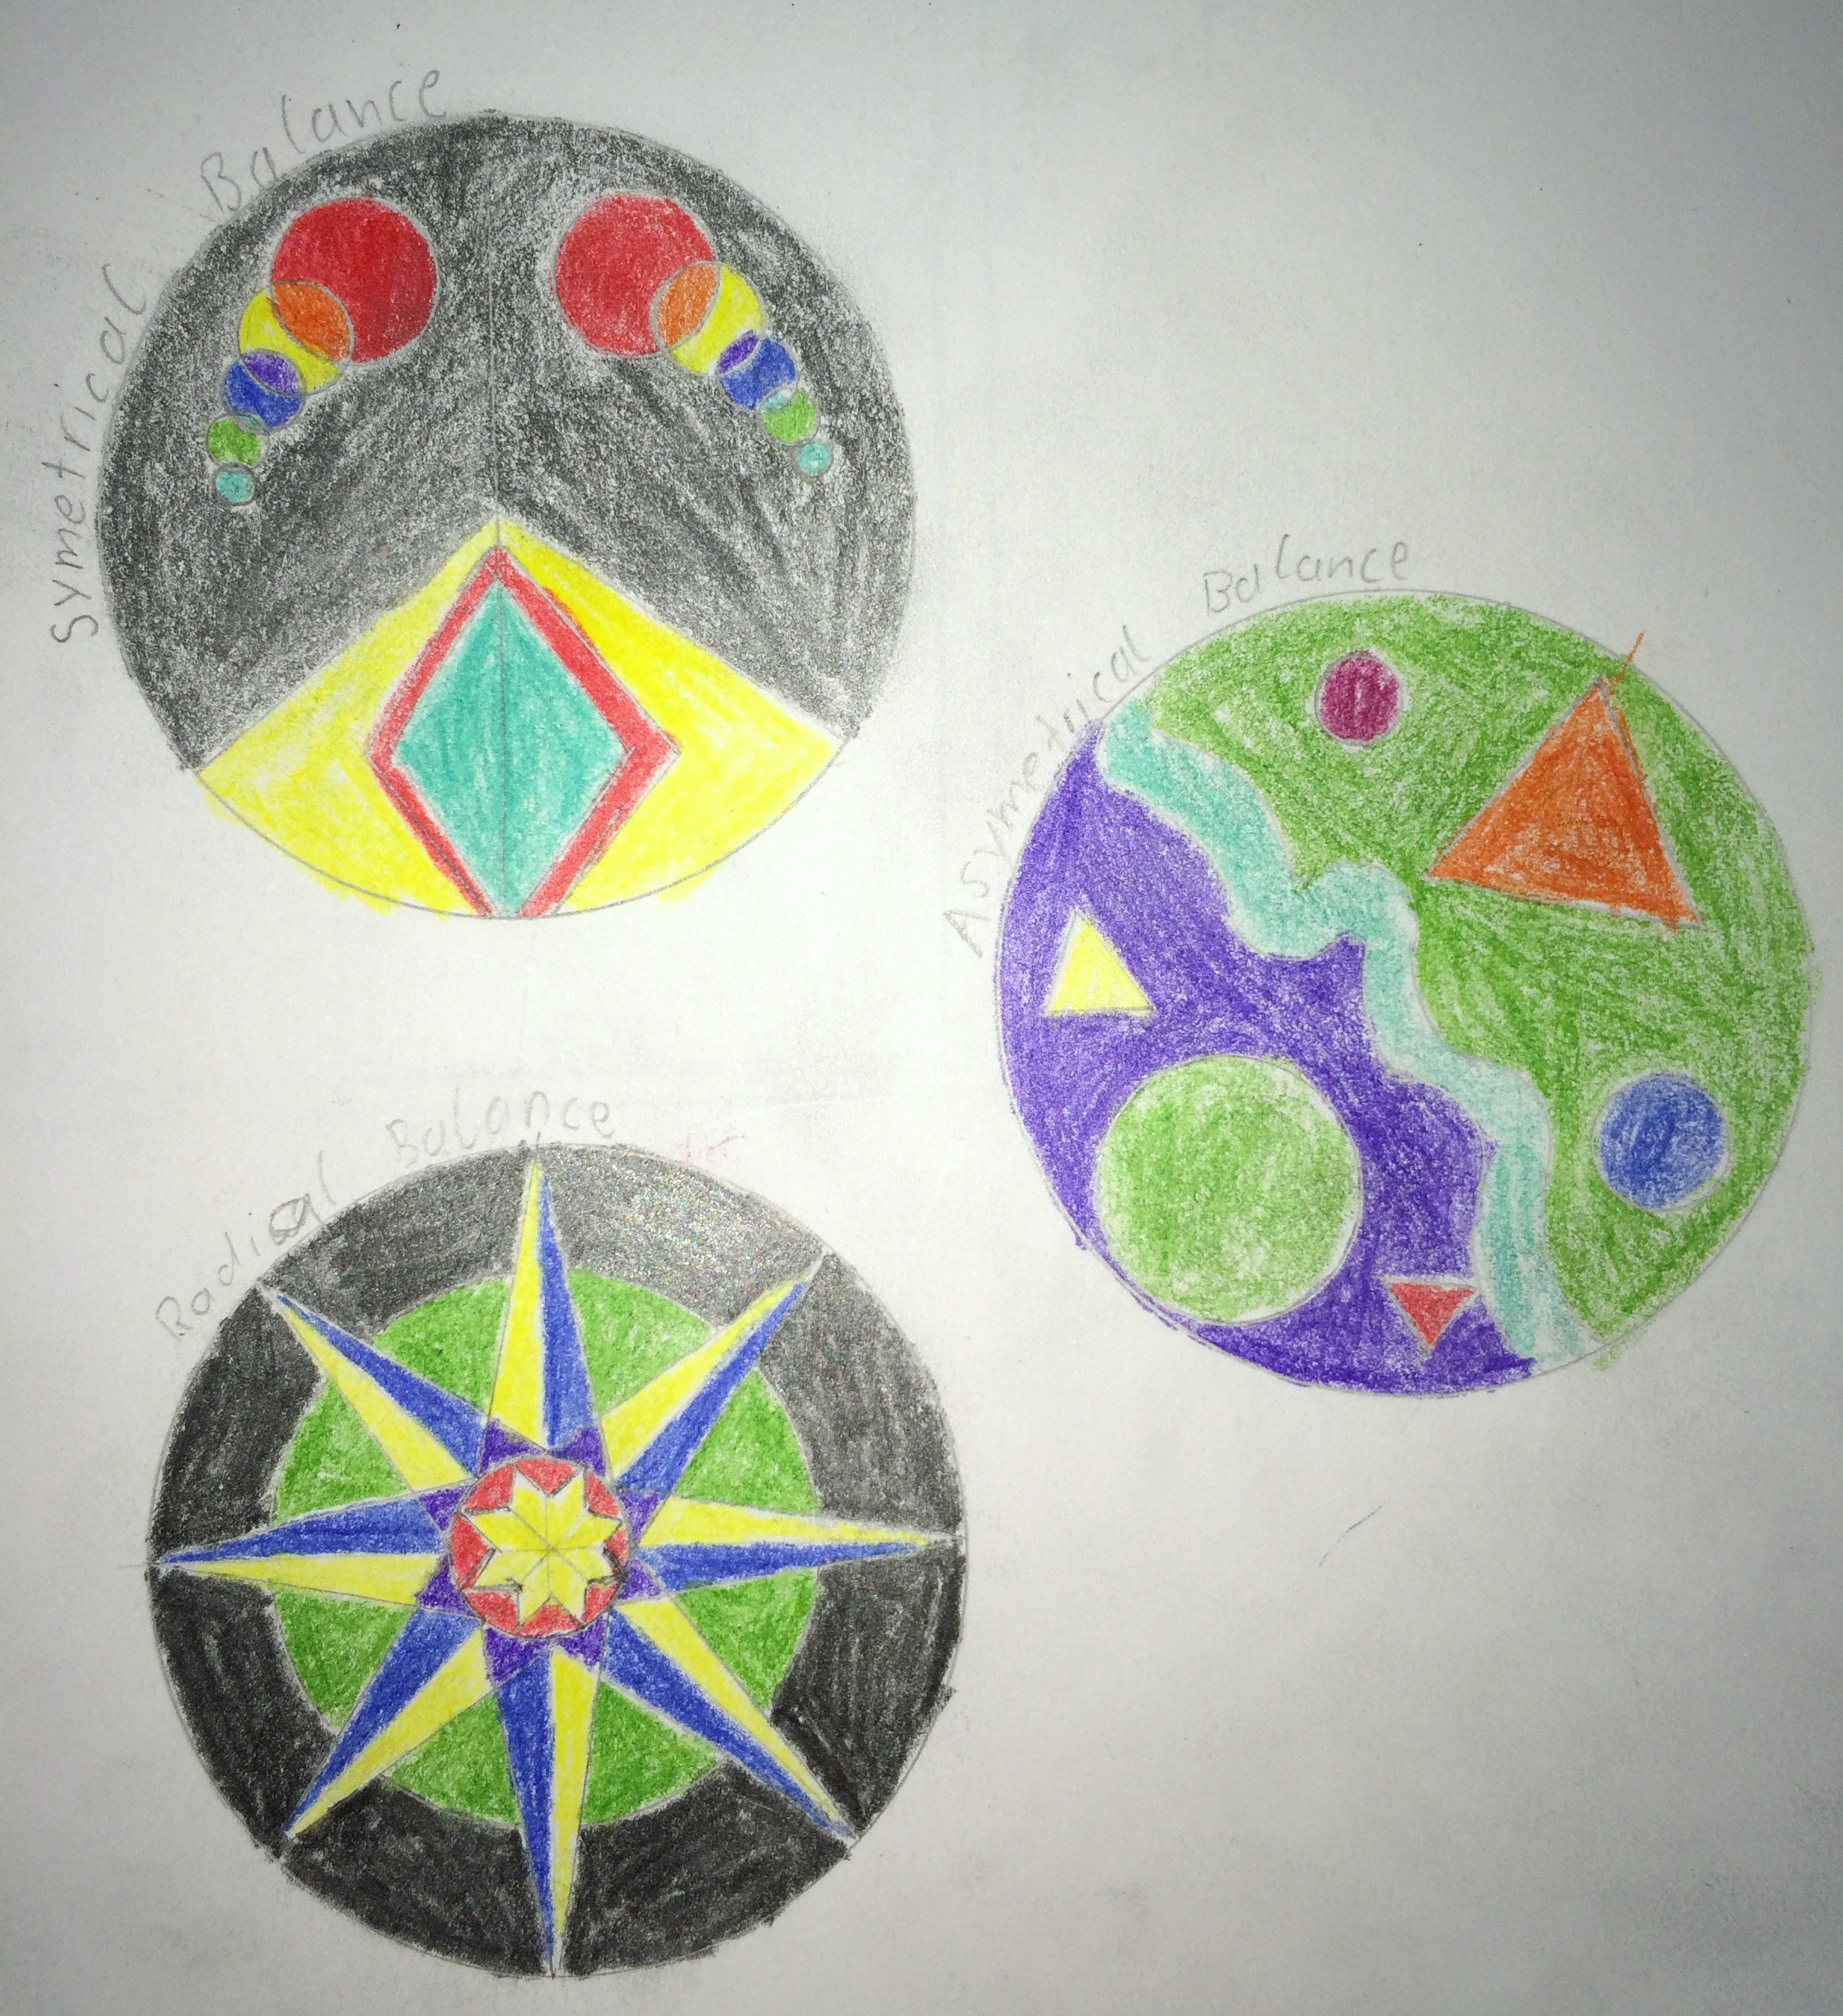 Cpm Homework Help Geometry Of A Circle X Land